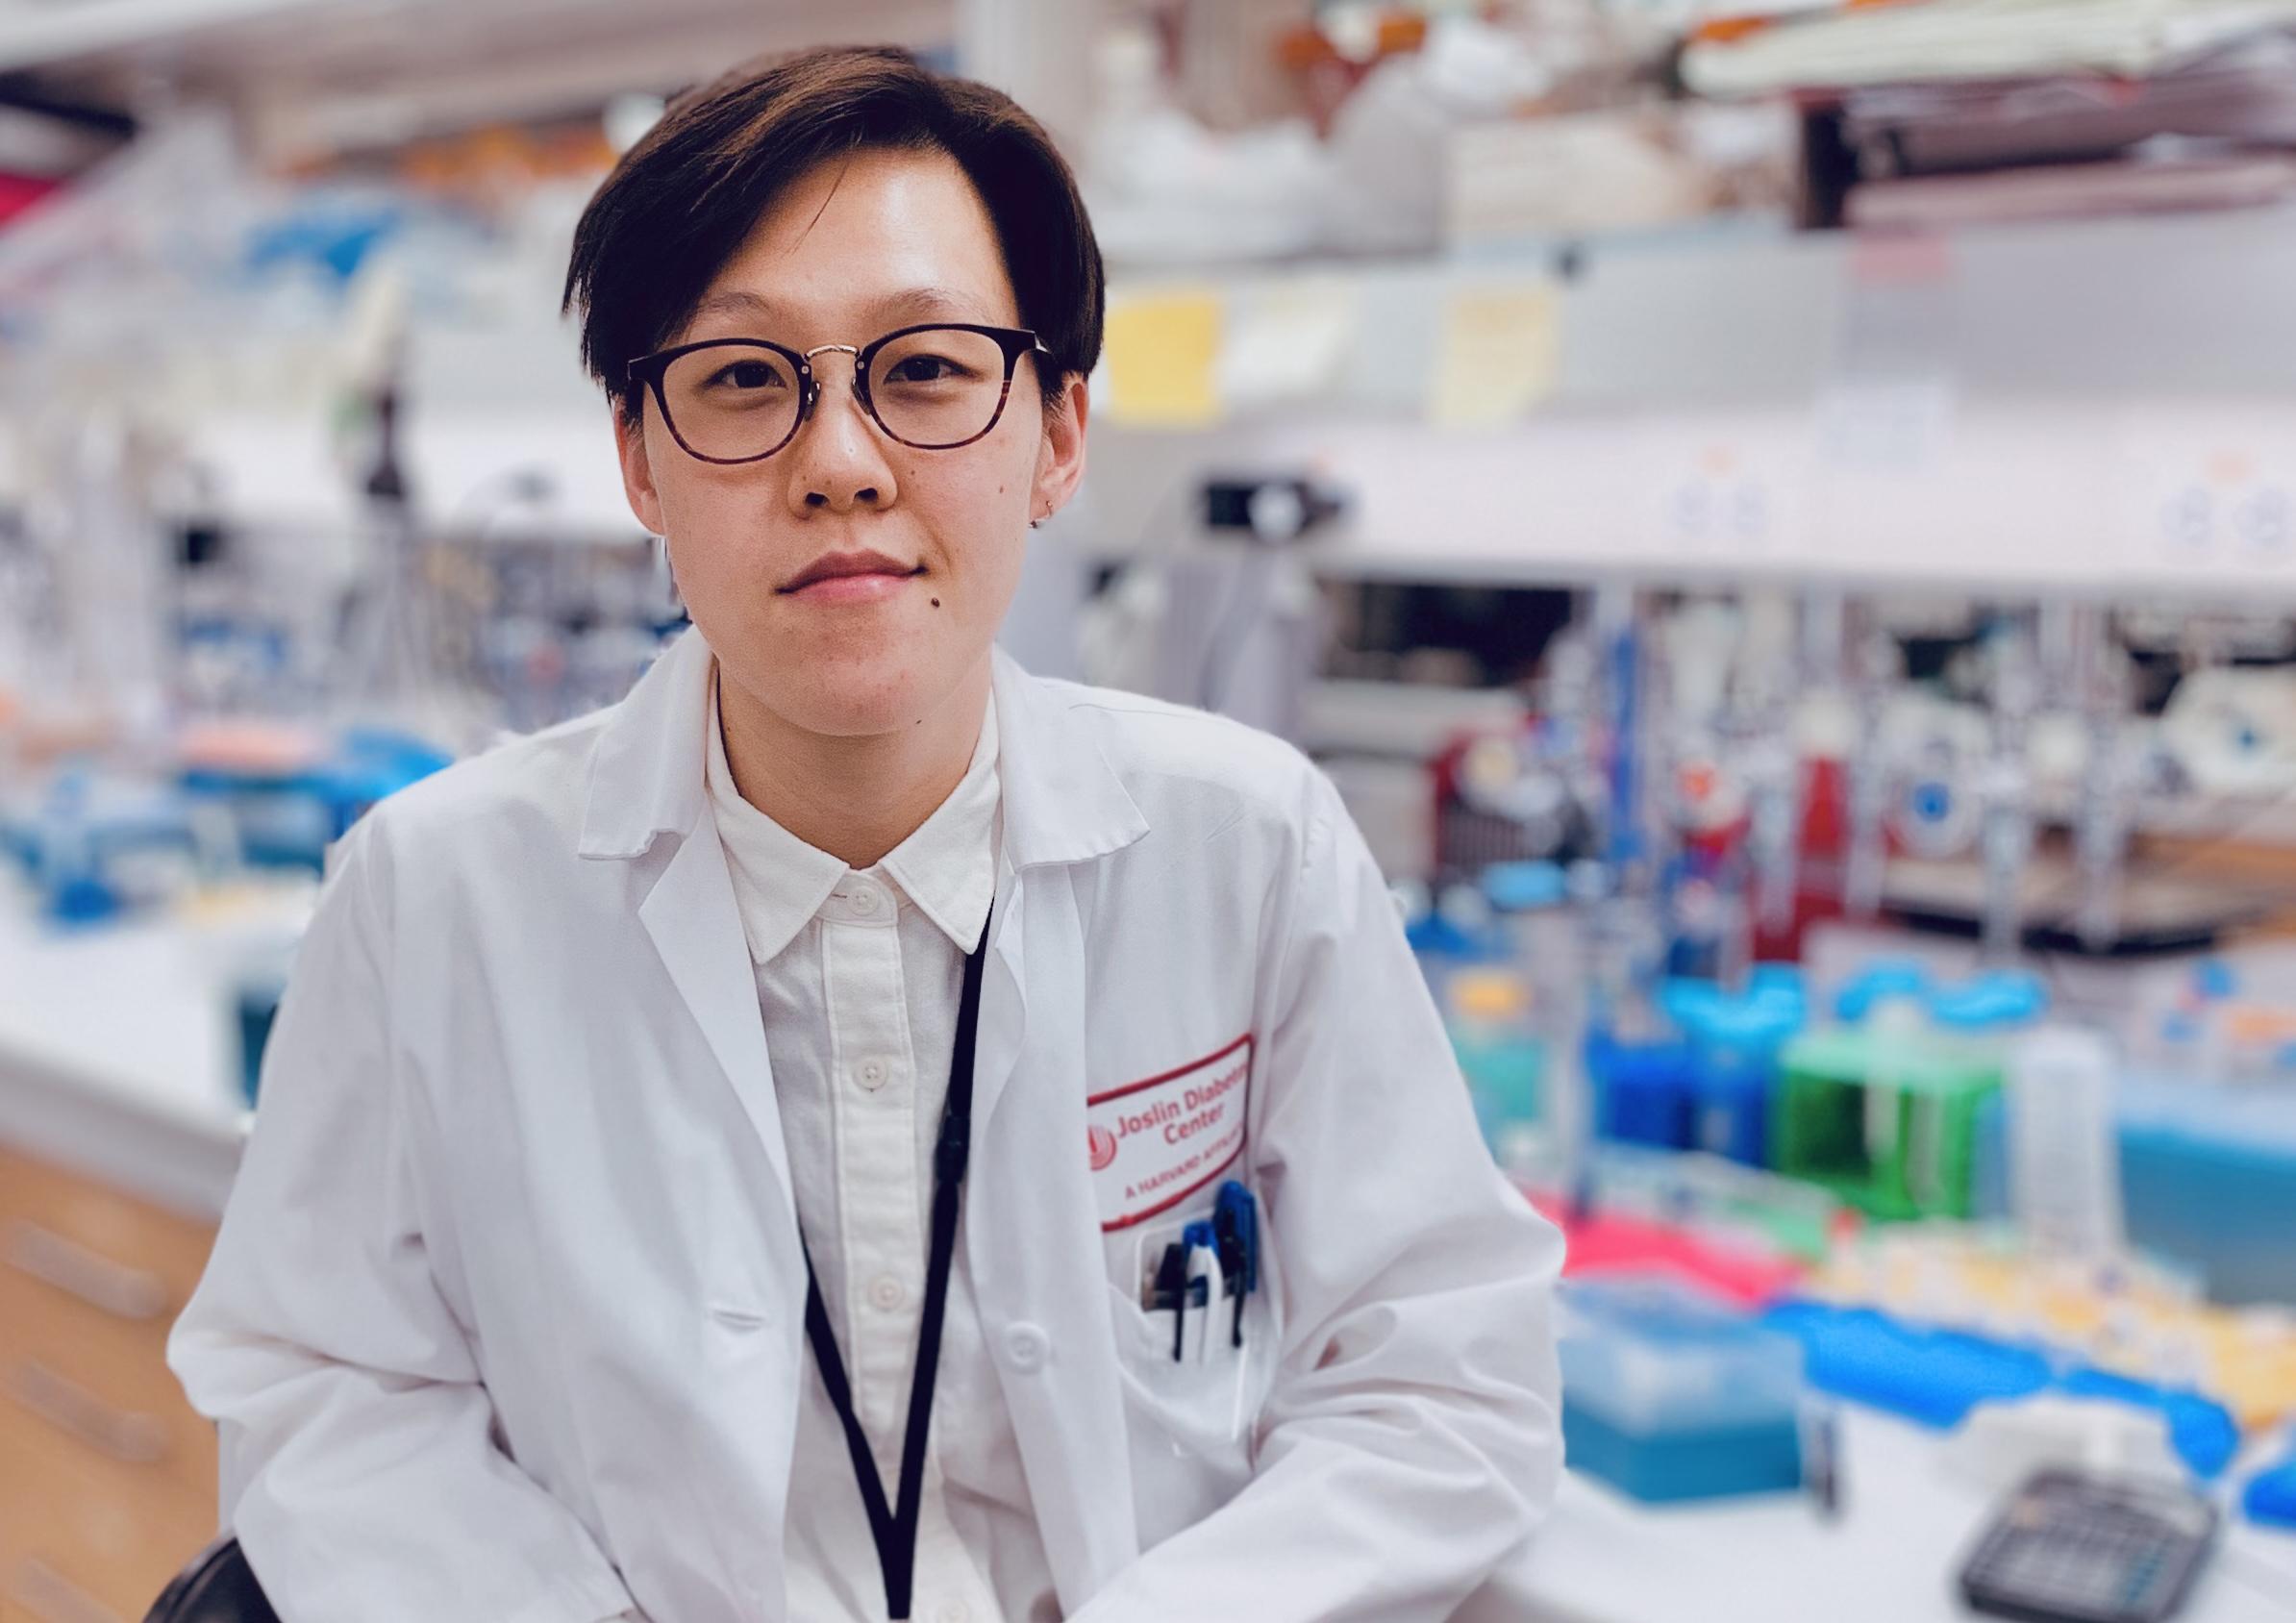 Erica Cai Named ALPCO's Summer 2020 Diabetes Research Travel Grant Recipient